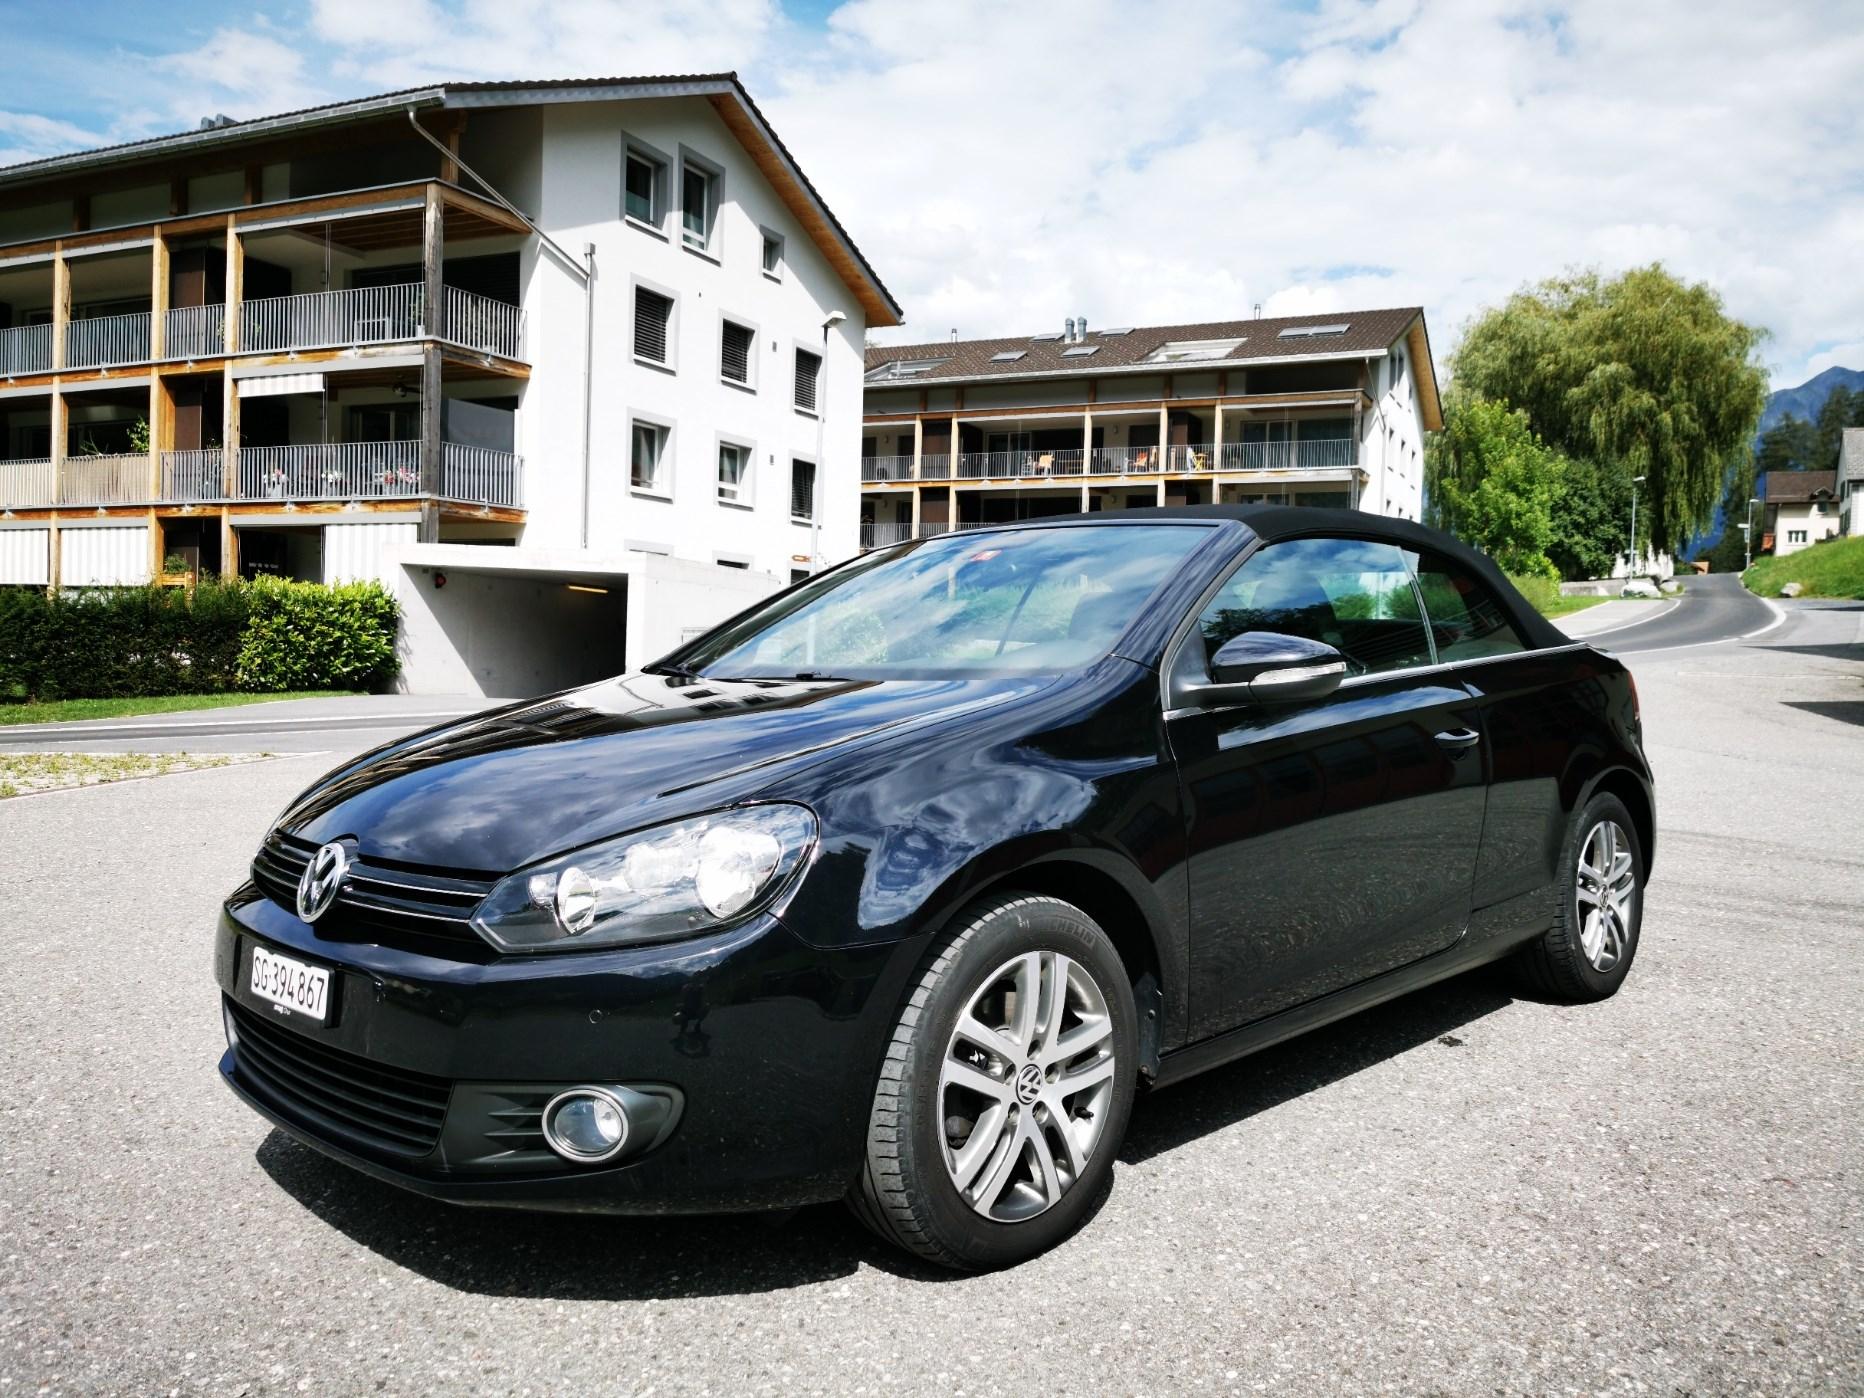 VW Golf VI Cabriolet 1.2 TSI BlueMT Black Line